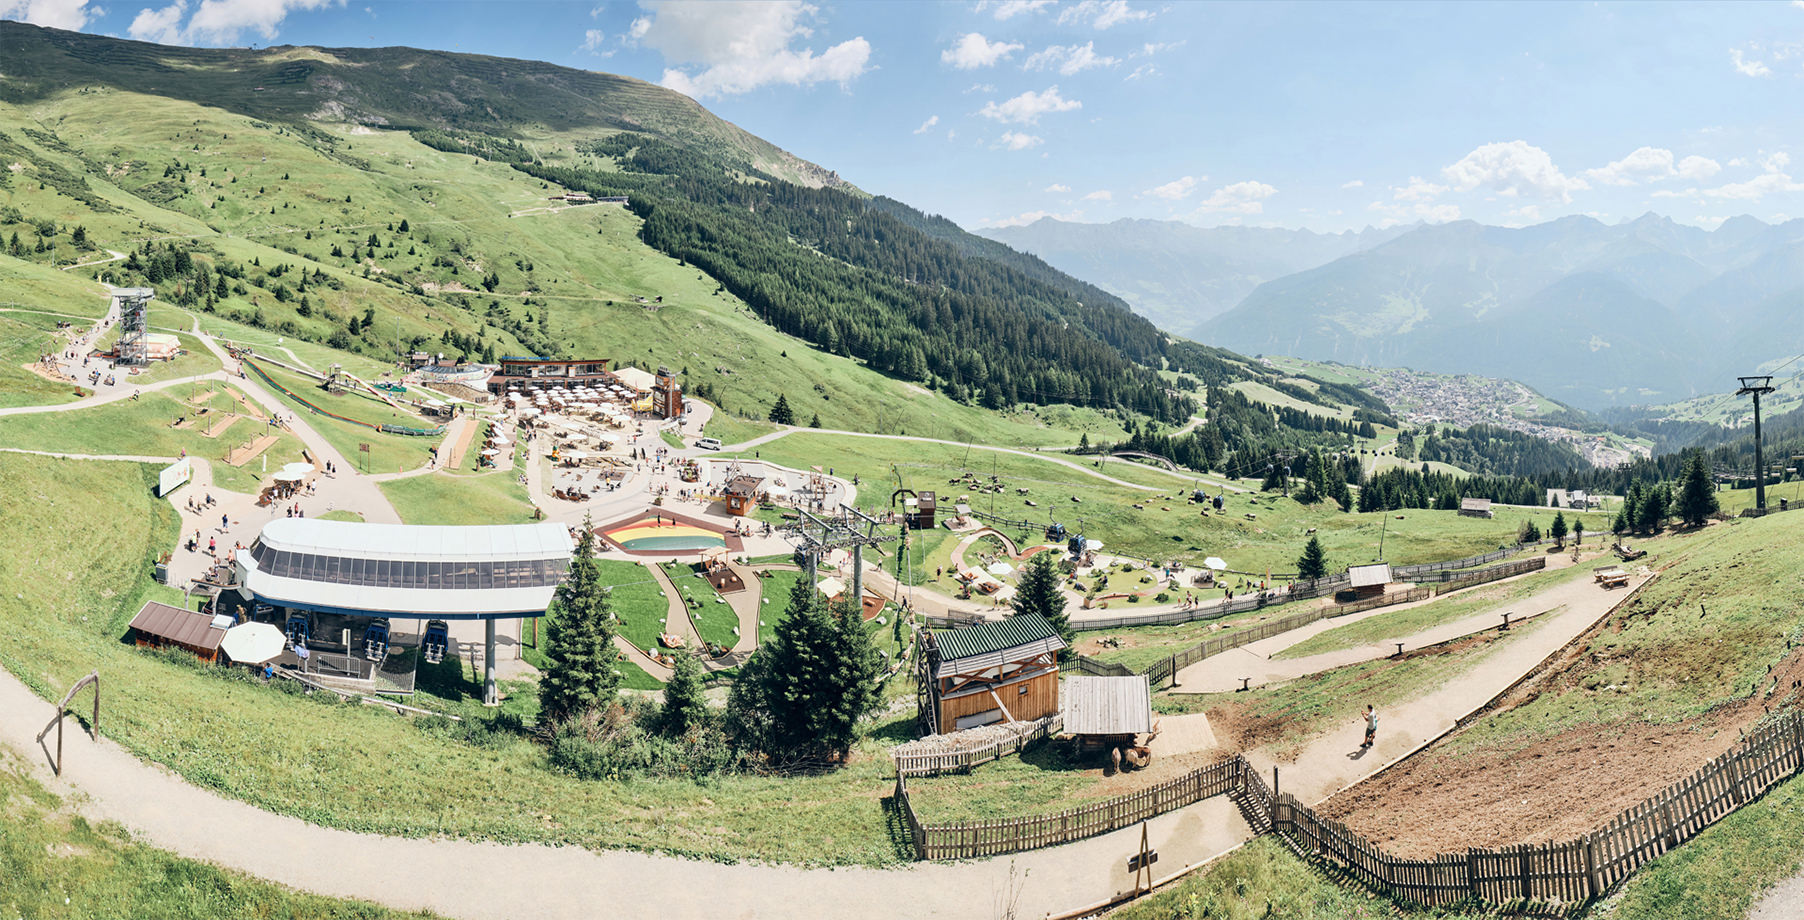 Bergbahnen_Fiss_30-07-2020-Moseralm_Pano_02.jpg